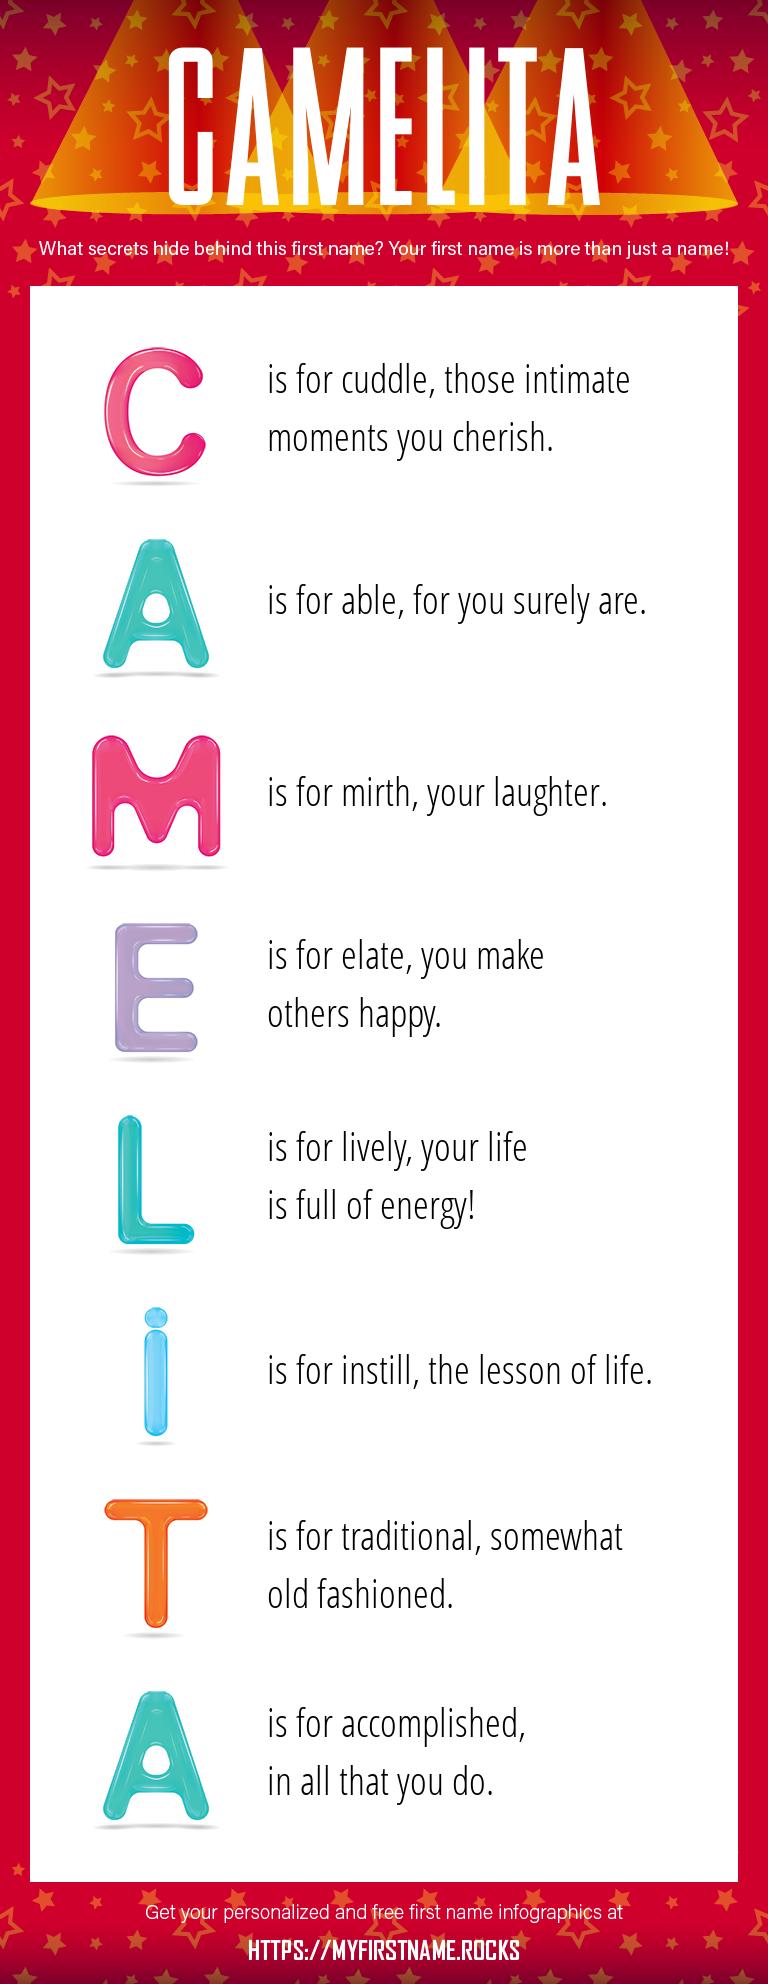 Camelita Infographics